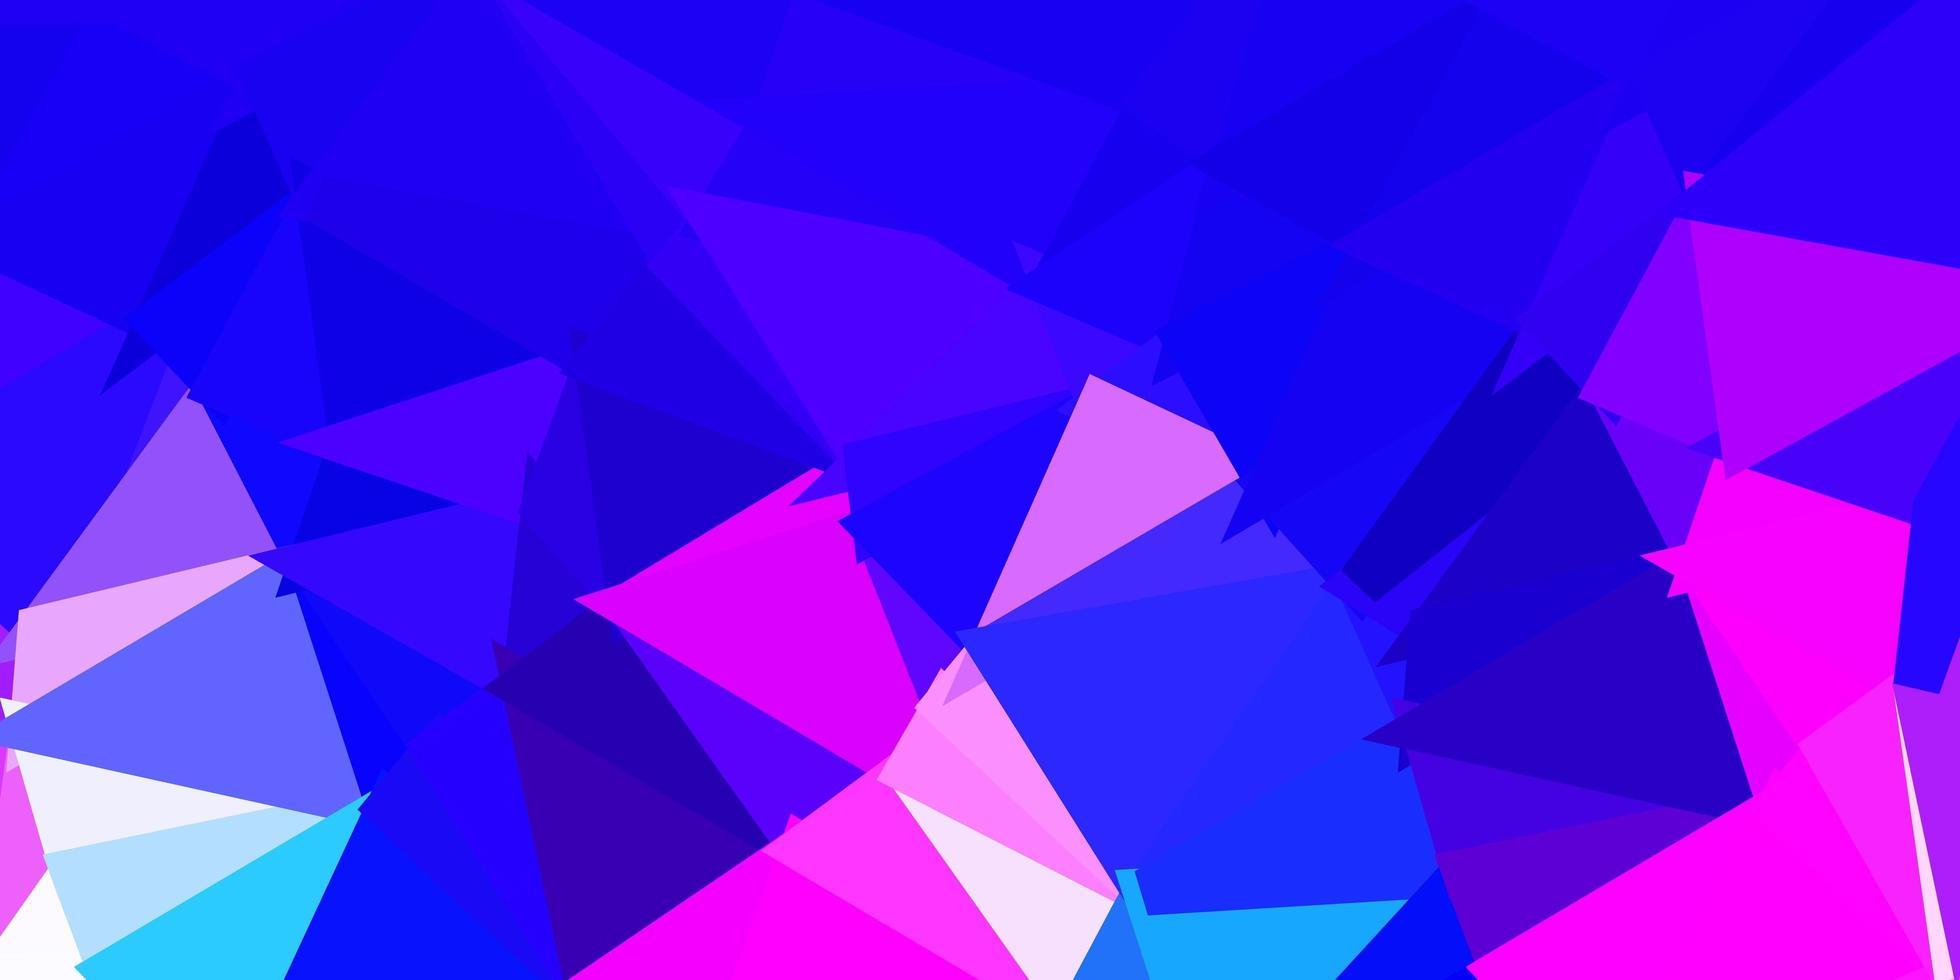 donkerroze, blauw vector abstract driehoekspatroon.